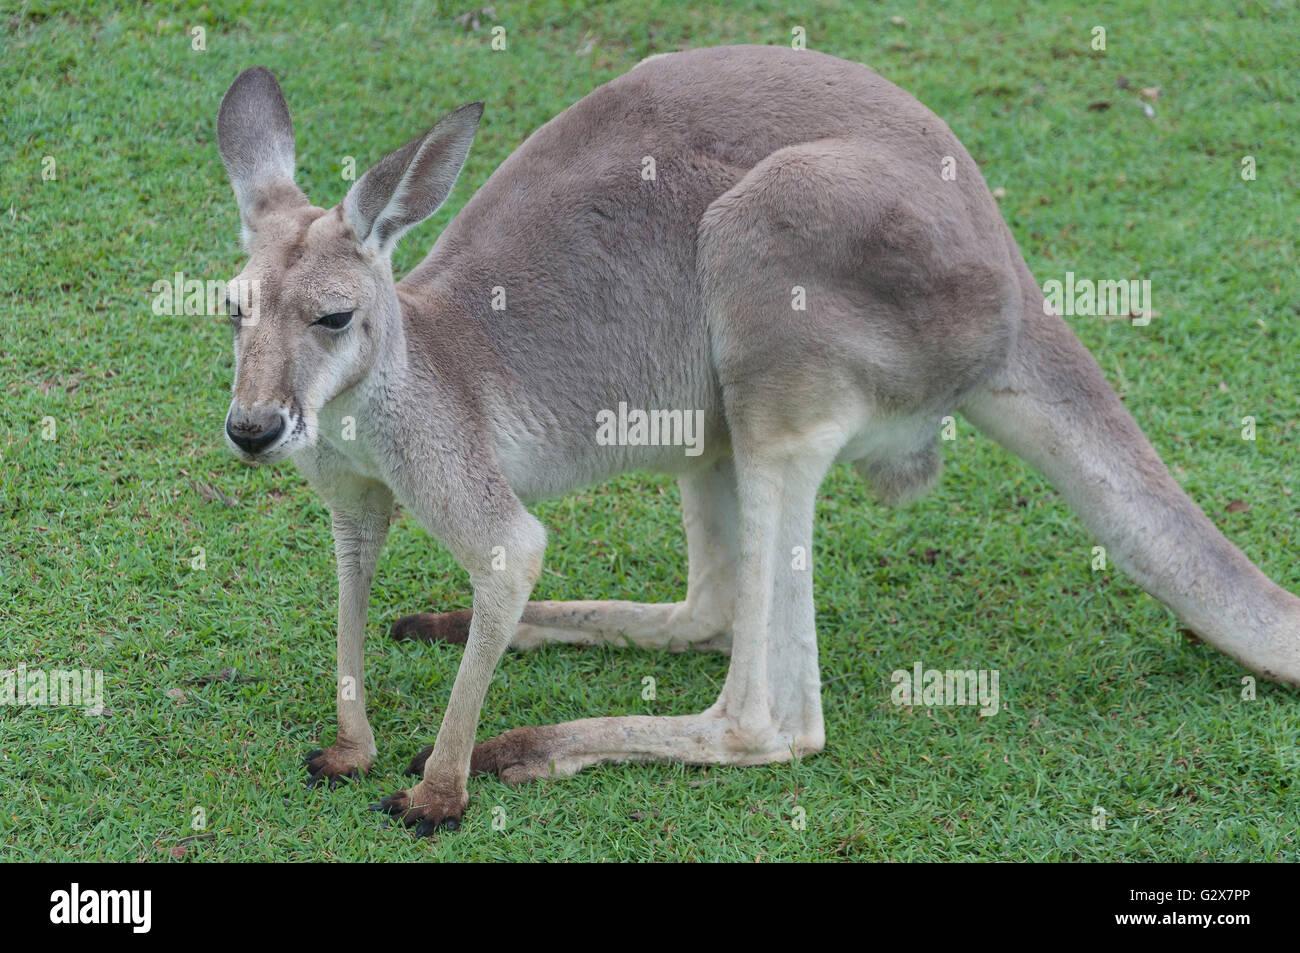 Occidentale Canguro grigio a Lone Pine Koala Sanctuary, Fig Tree Pocket, Brisbane, Queensland, Australia Immagini Stock